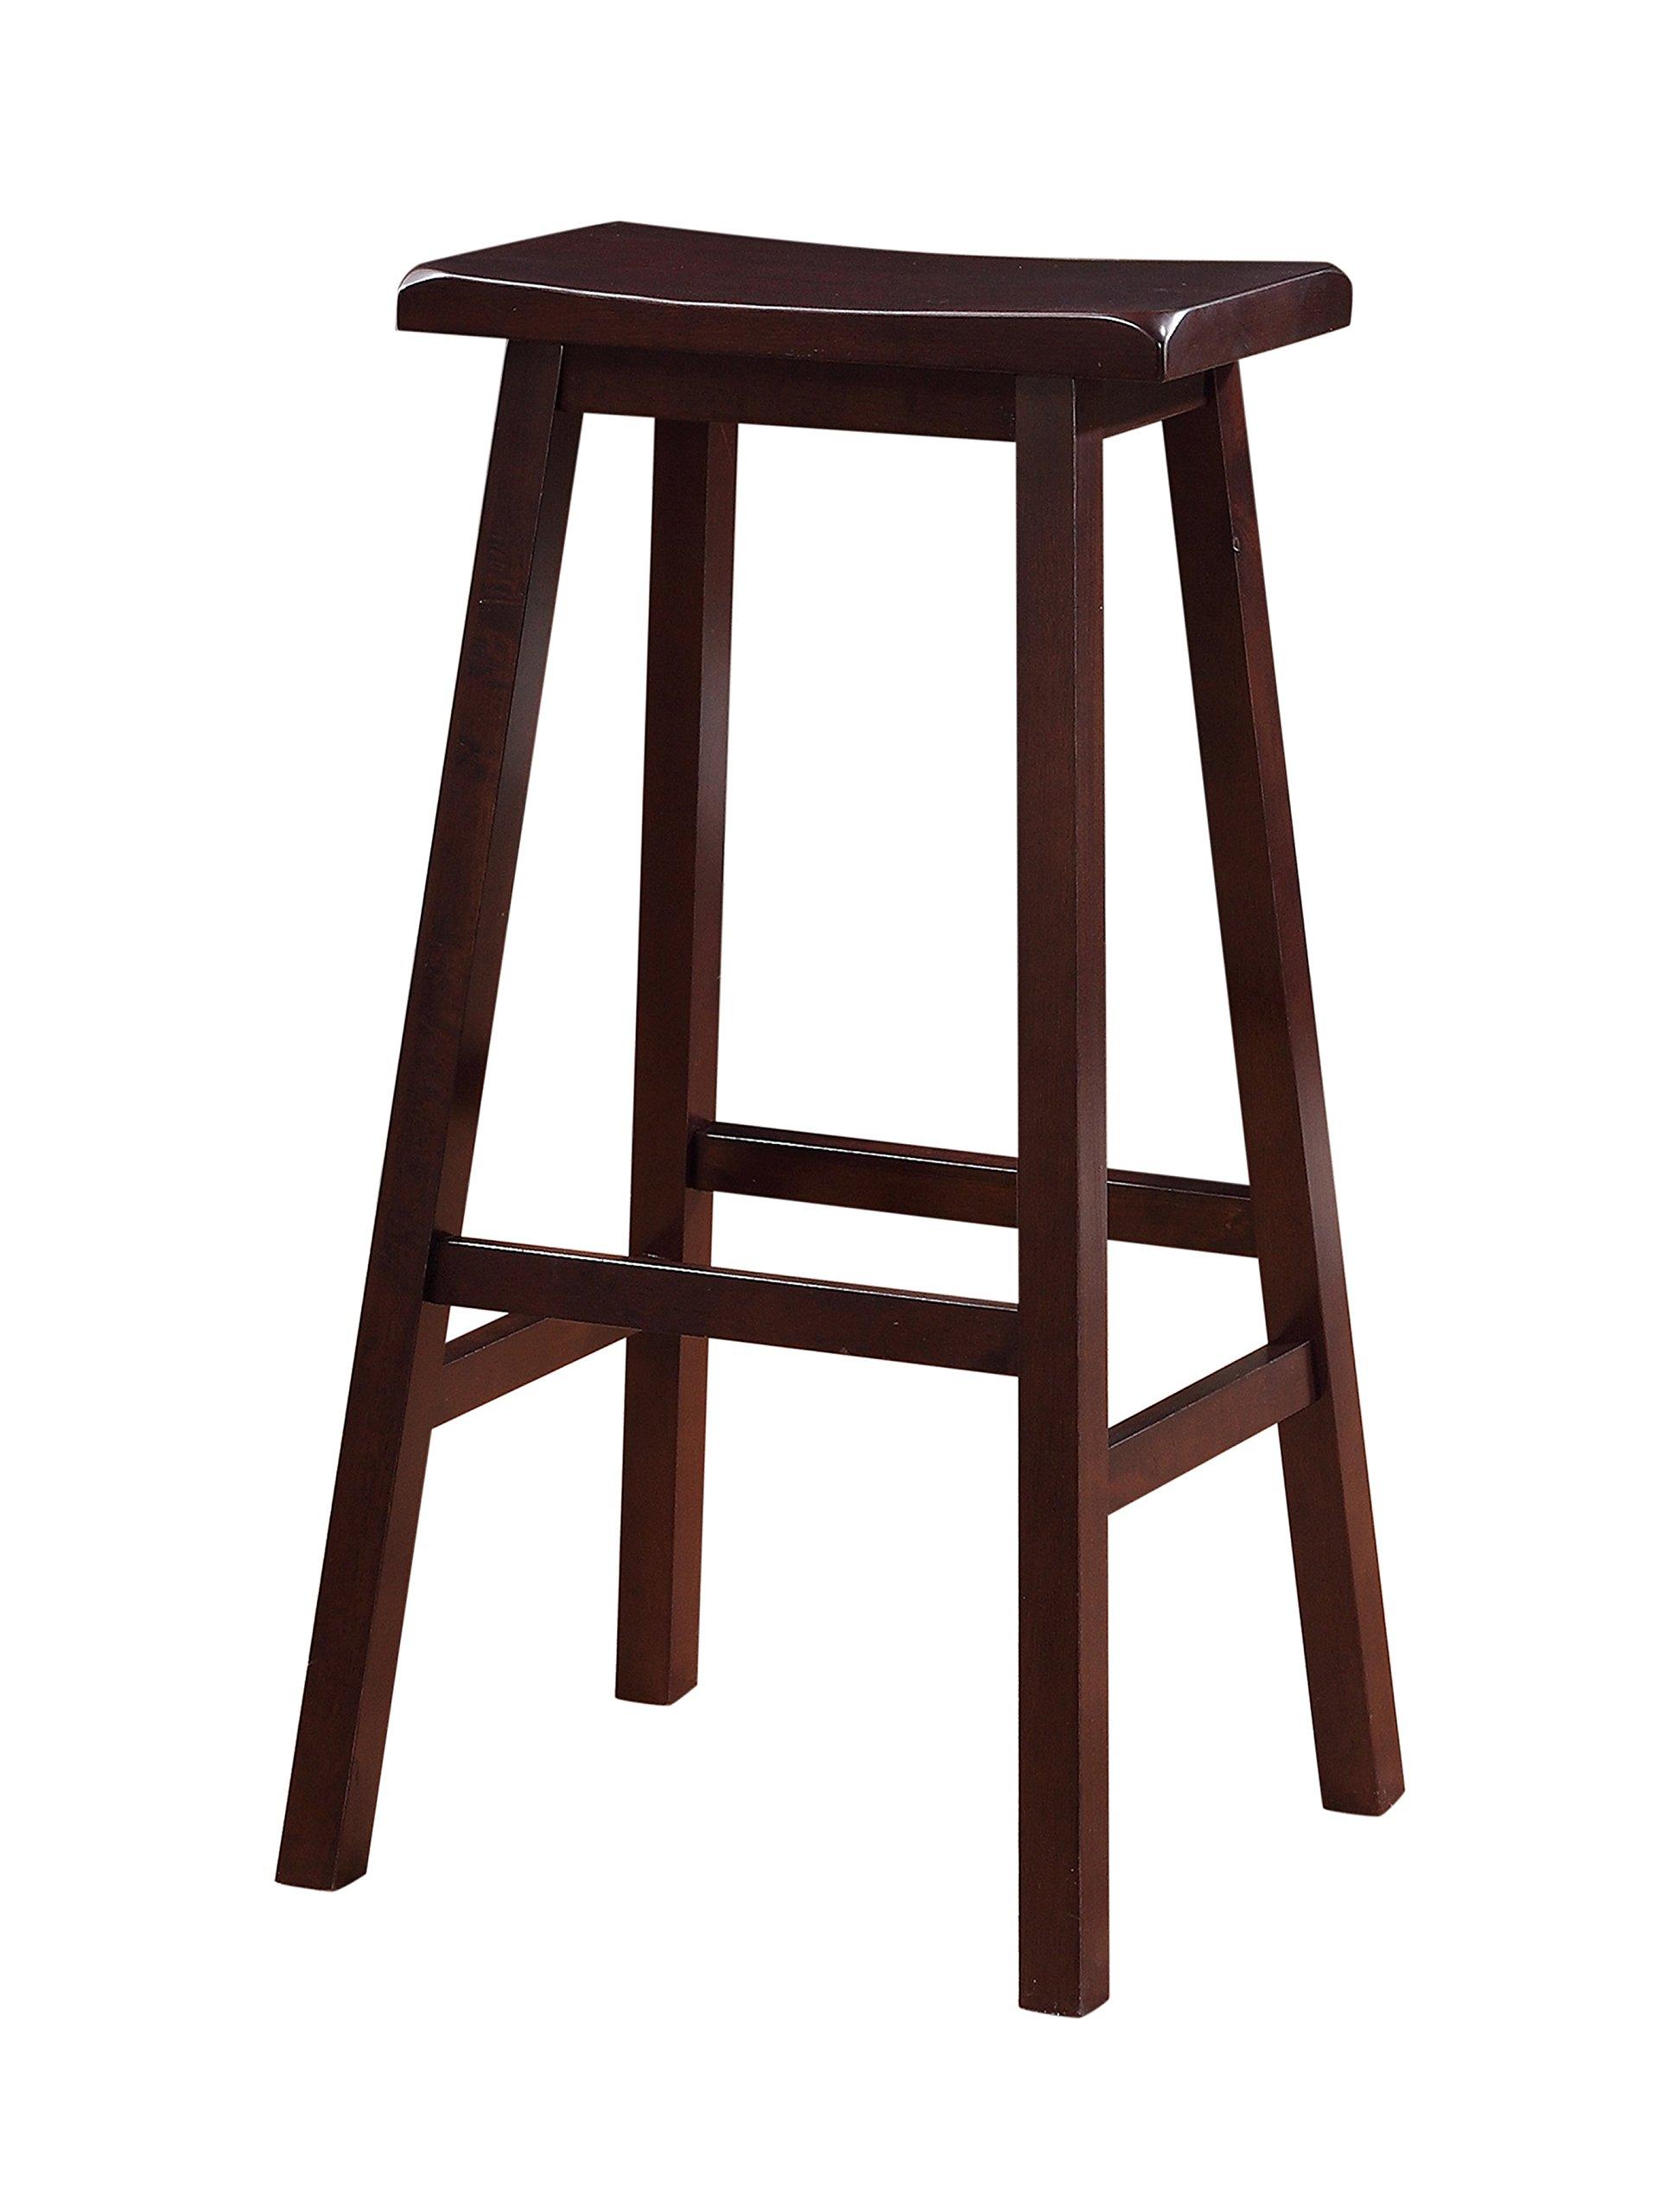 Linon Home Saddle Stool, 29-Inch